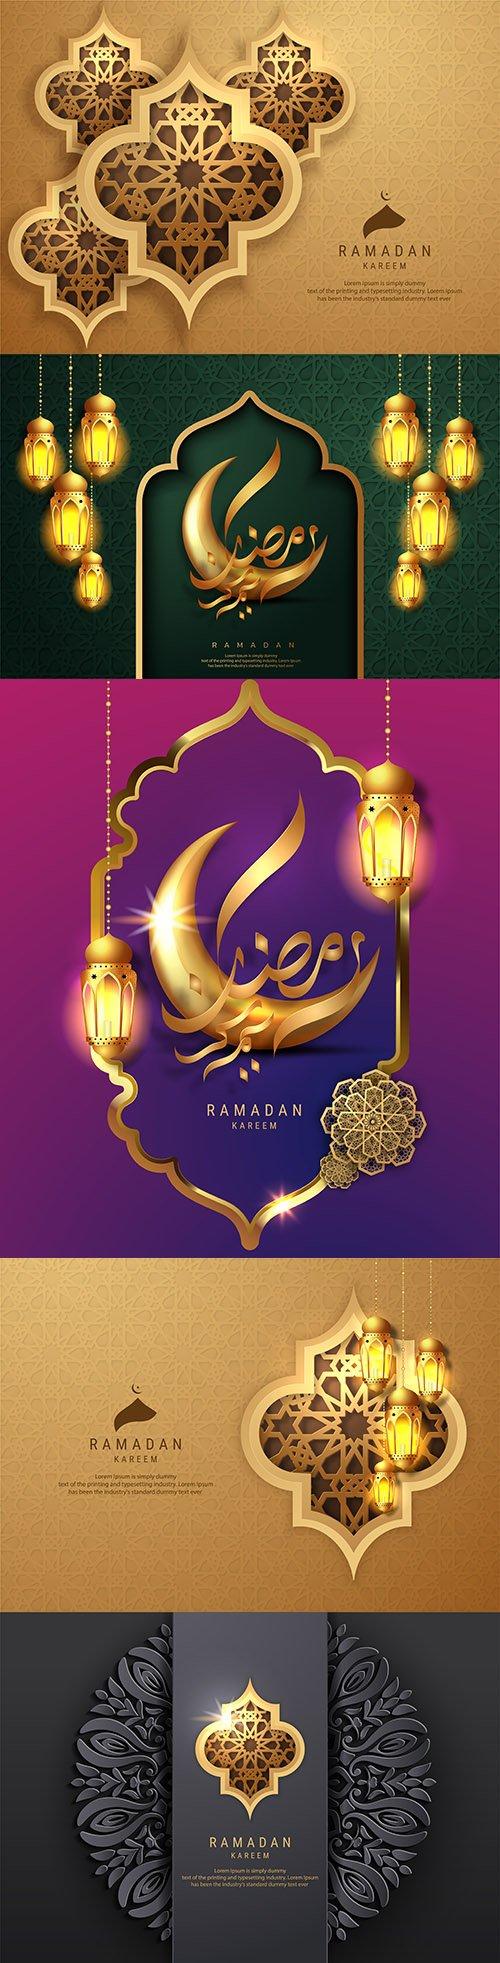 Ramadan Kareem Arab calligraphy design illustrations 20